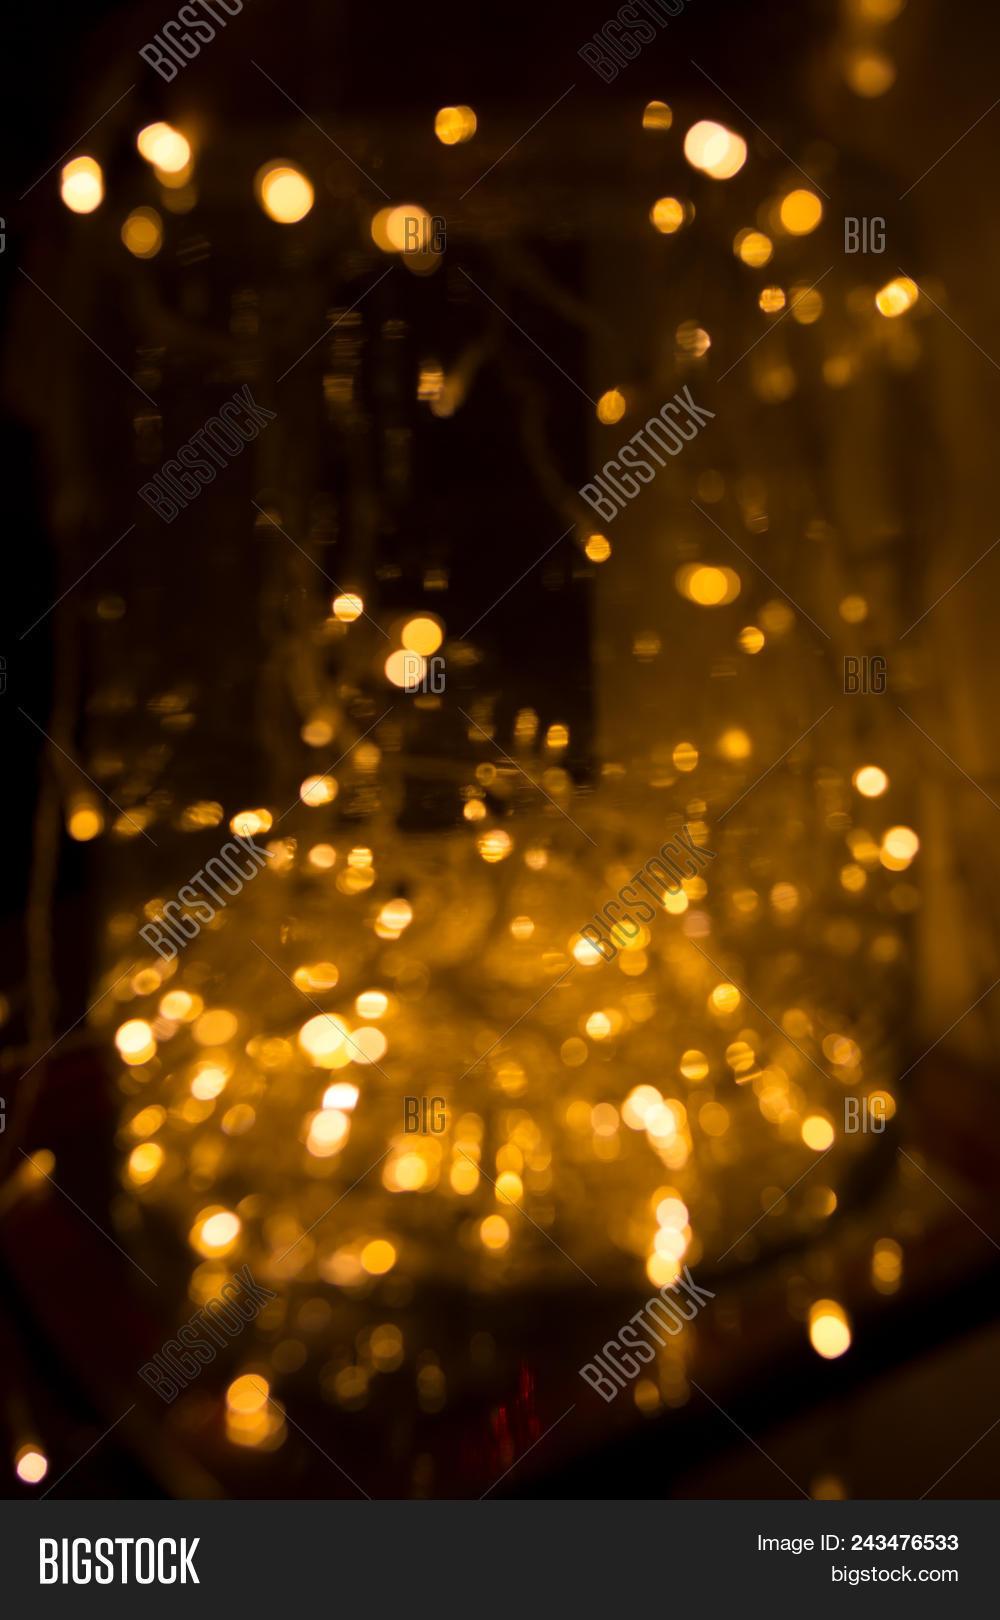 Golden Lights  Image & Photo (Free Trial)   Bigstock